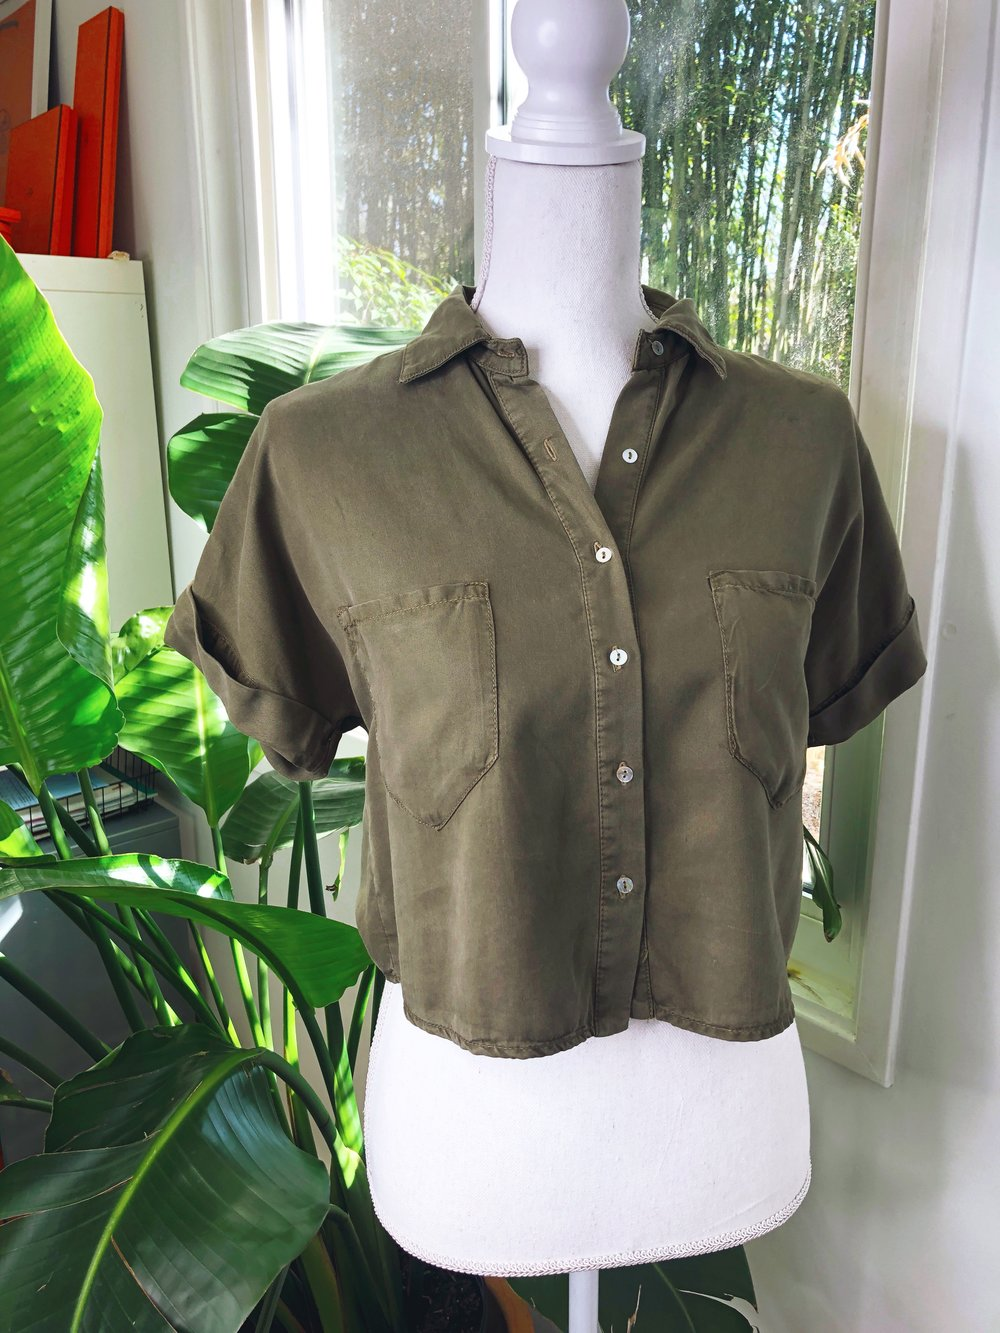 Zara Camp Shirt